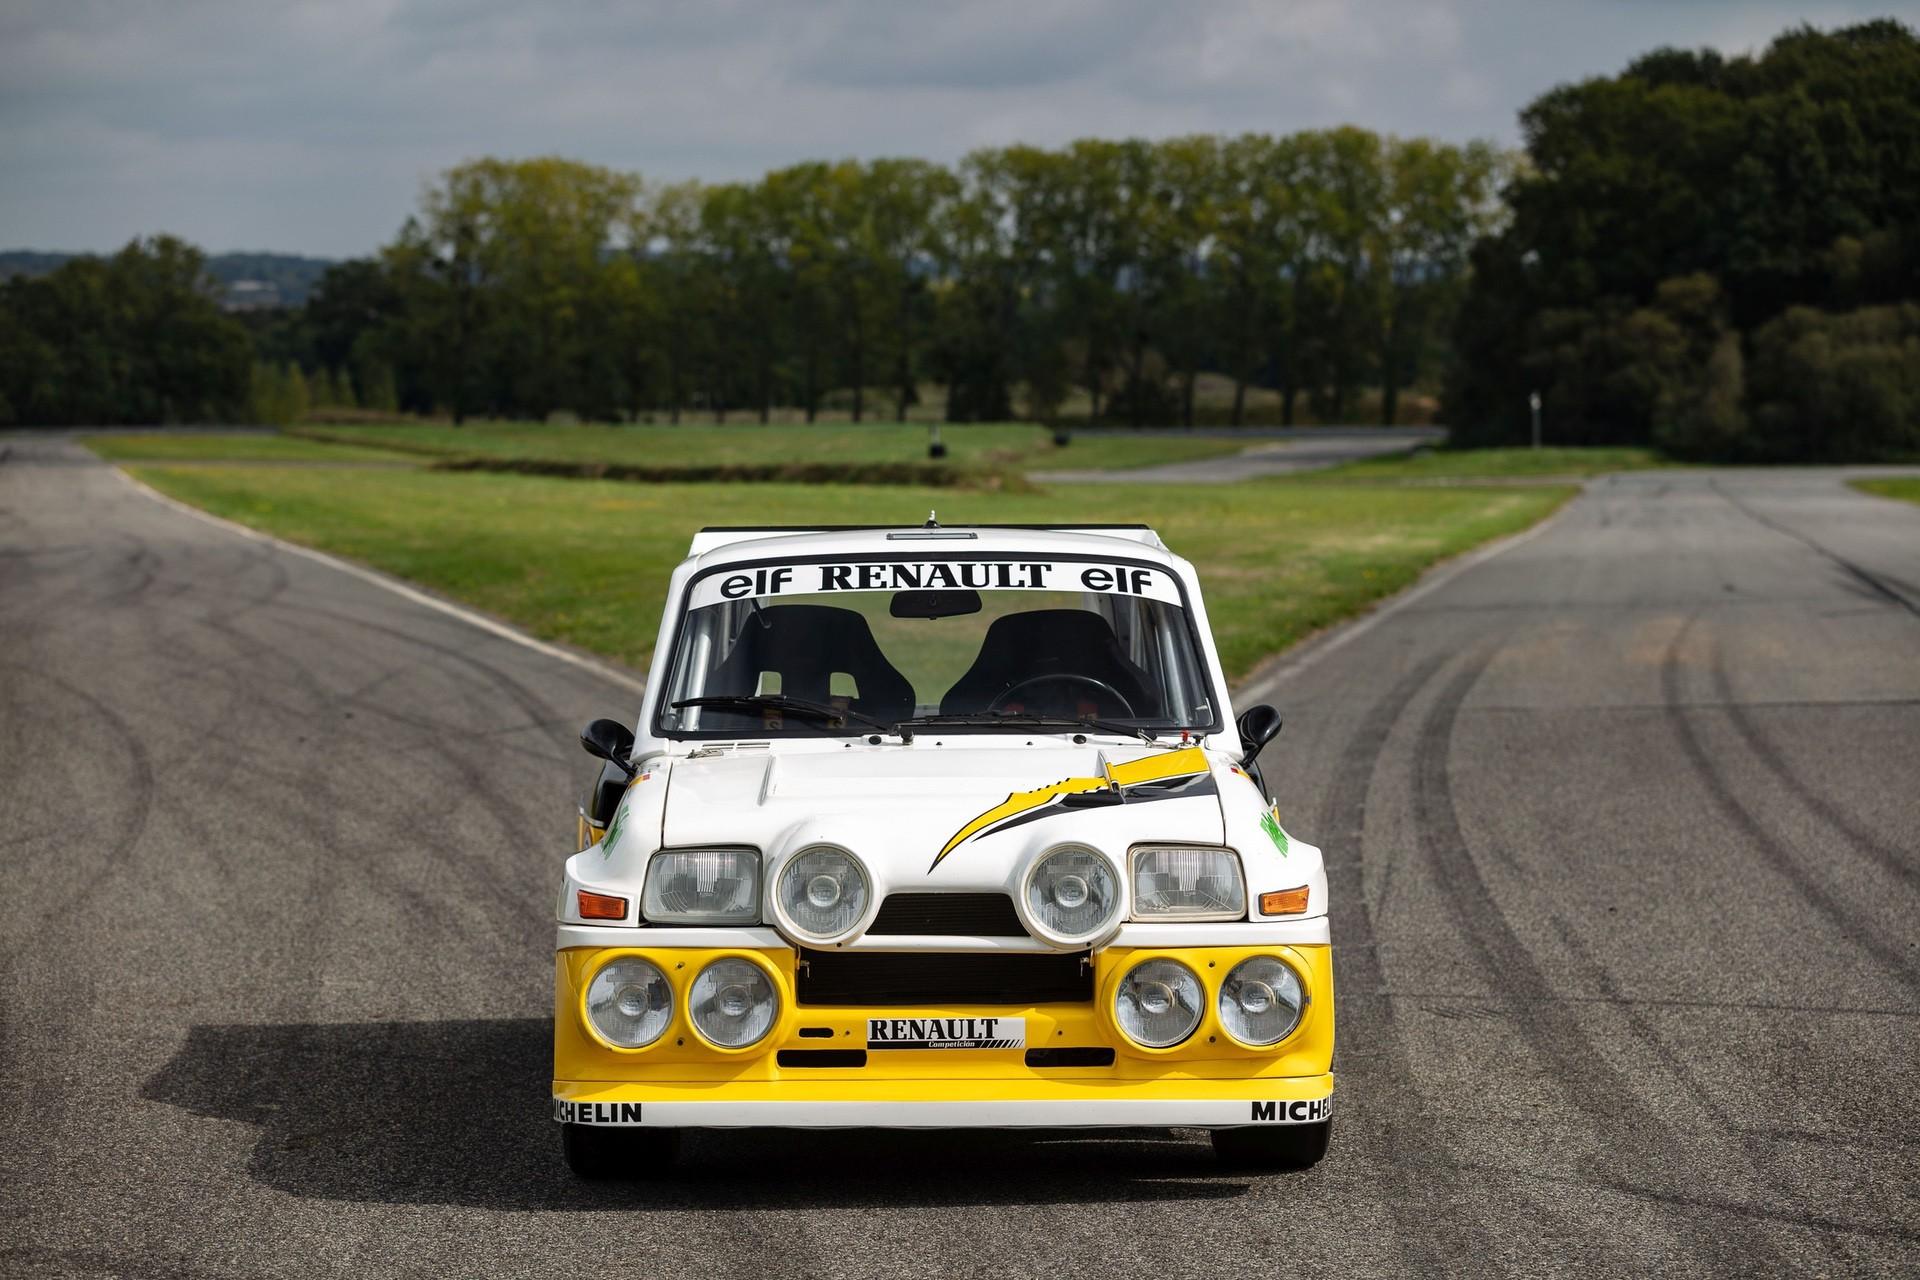 Renault_R5_Maxi_Turbo_ex-Carlos_Sainz-0001